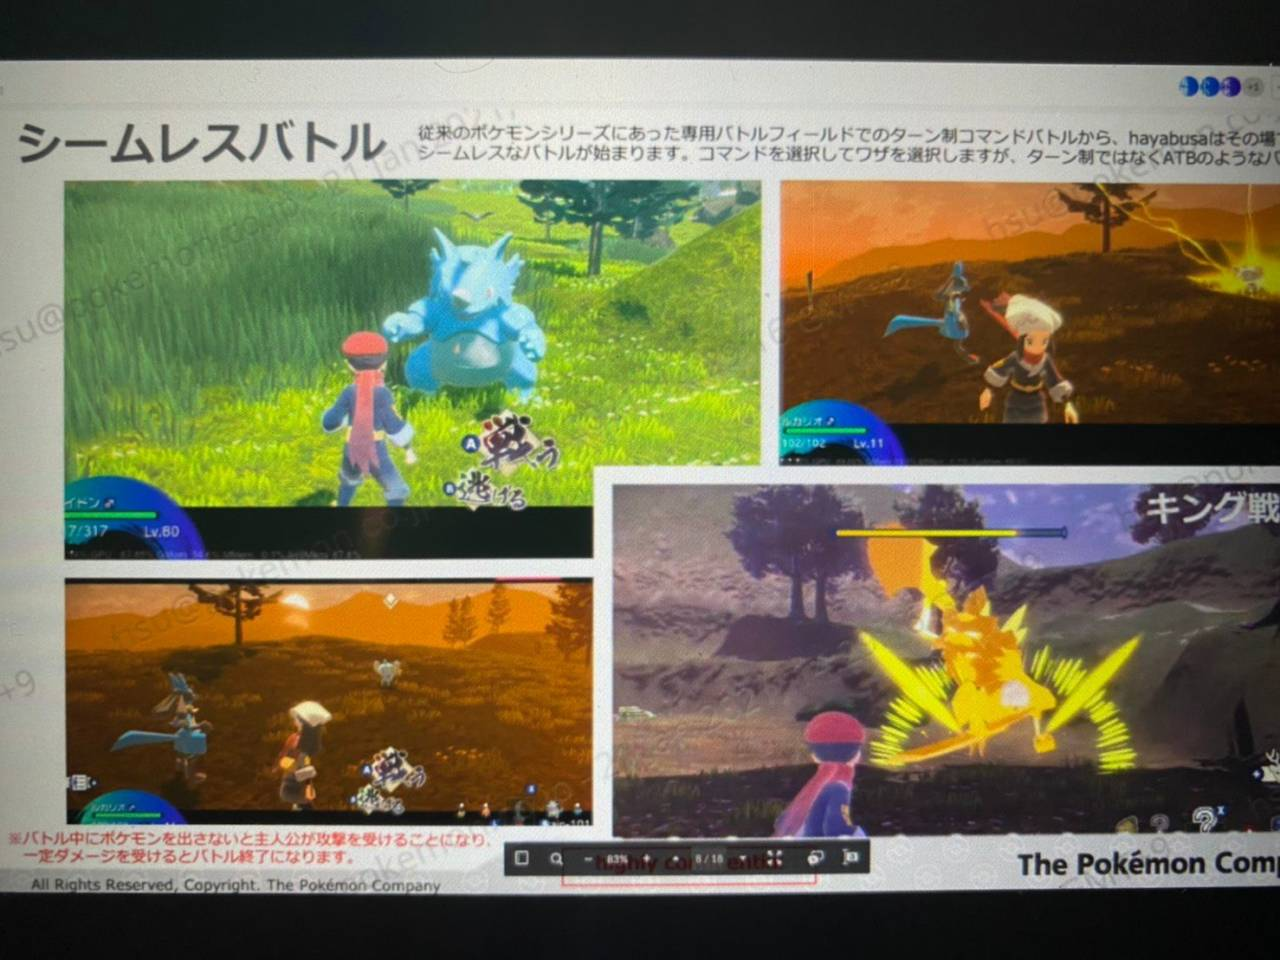 https://www.videogameschronicle.com/files/2021/02/Pokemon-leak.jpg